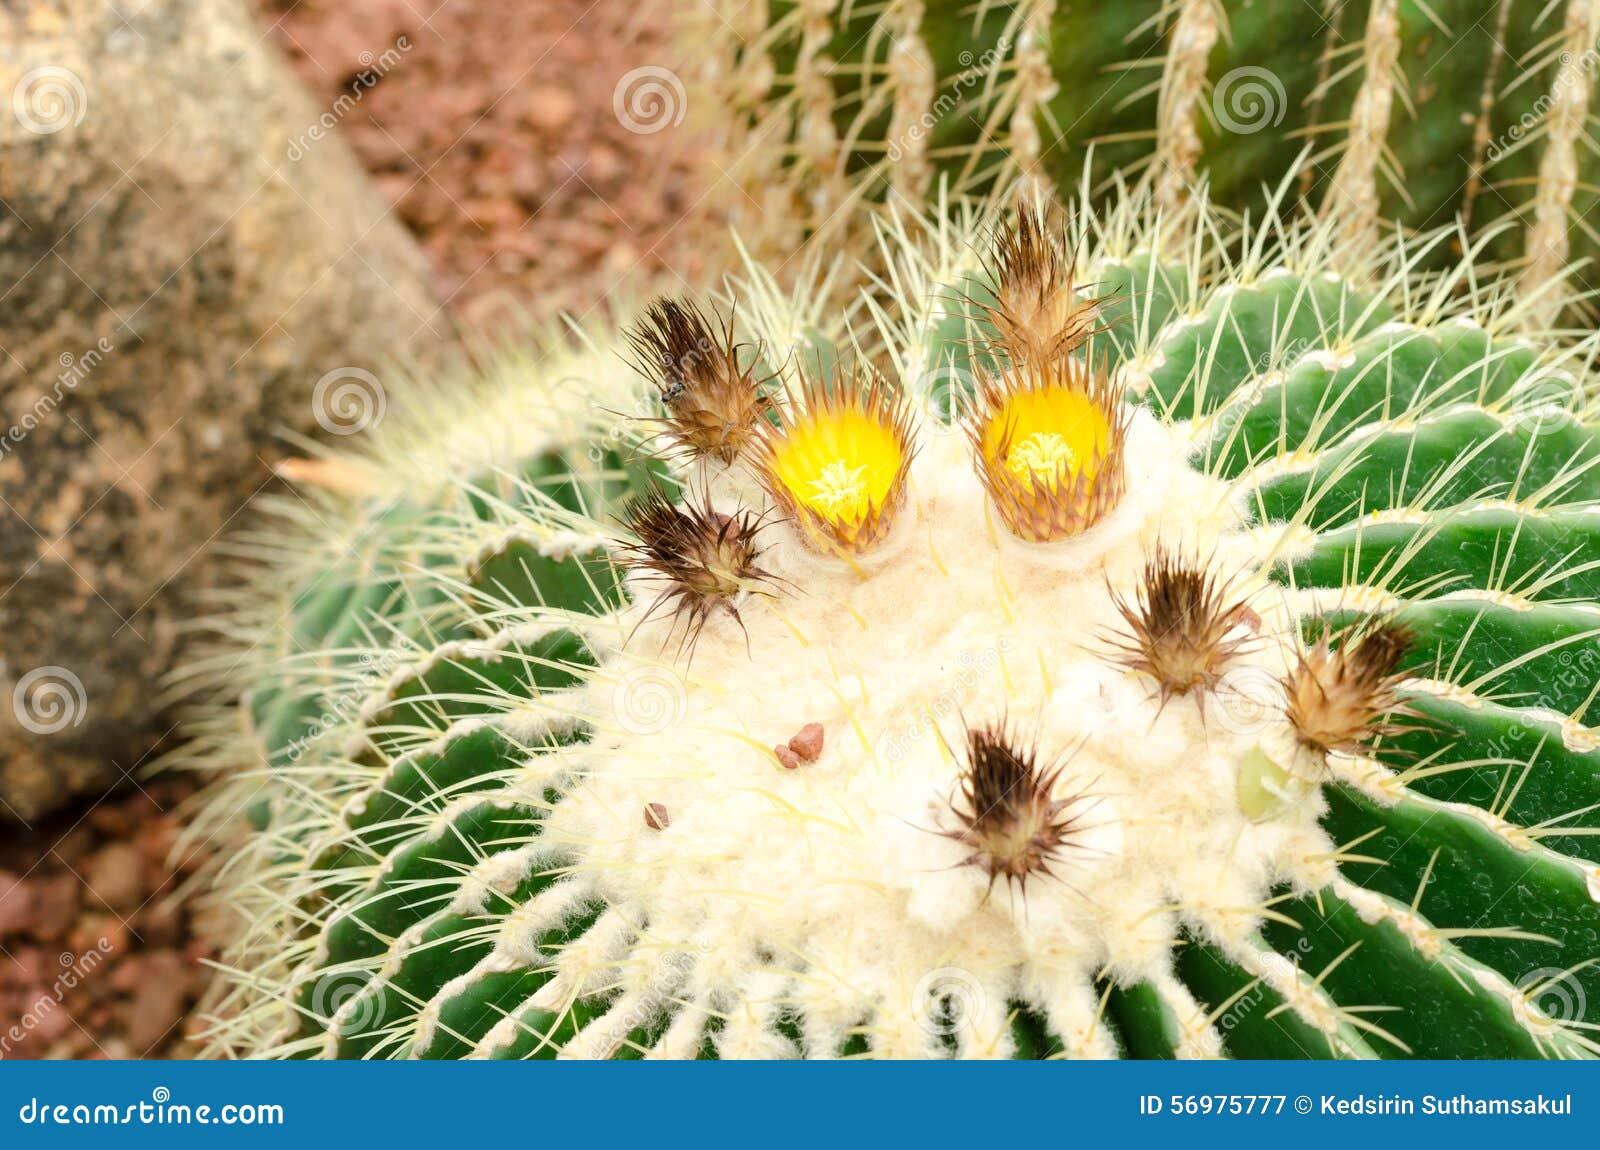 Close up of golden barrel cactus plant